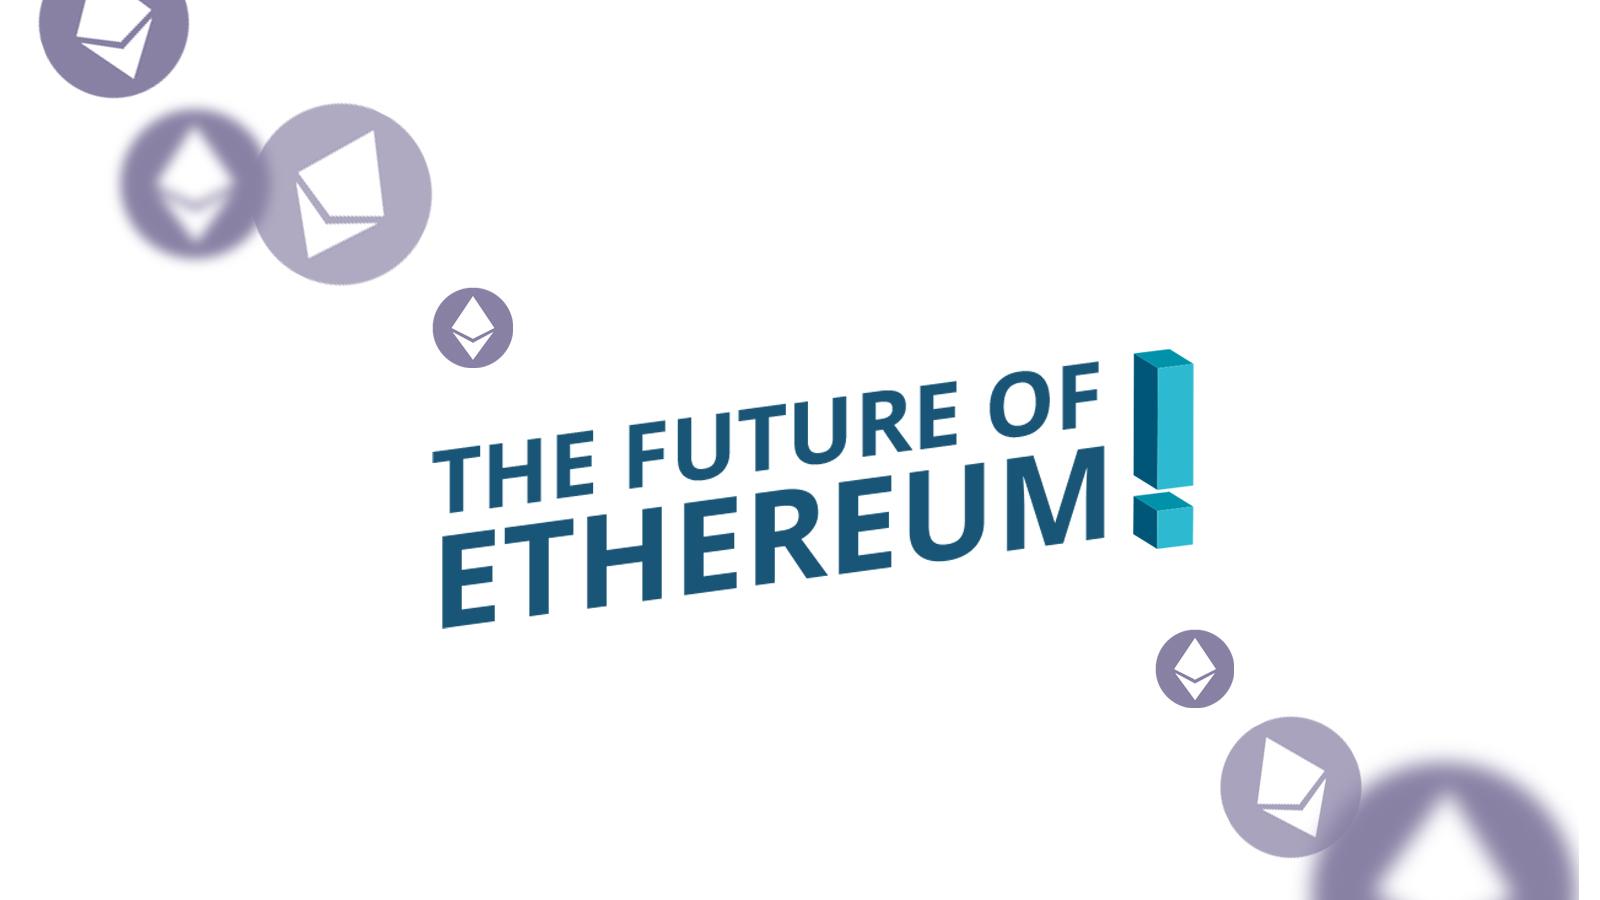 L'avenir d'Ethereum